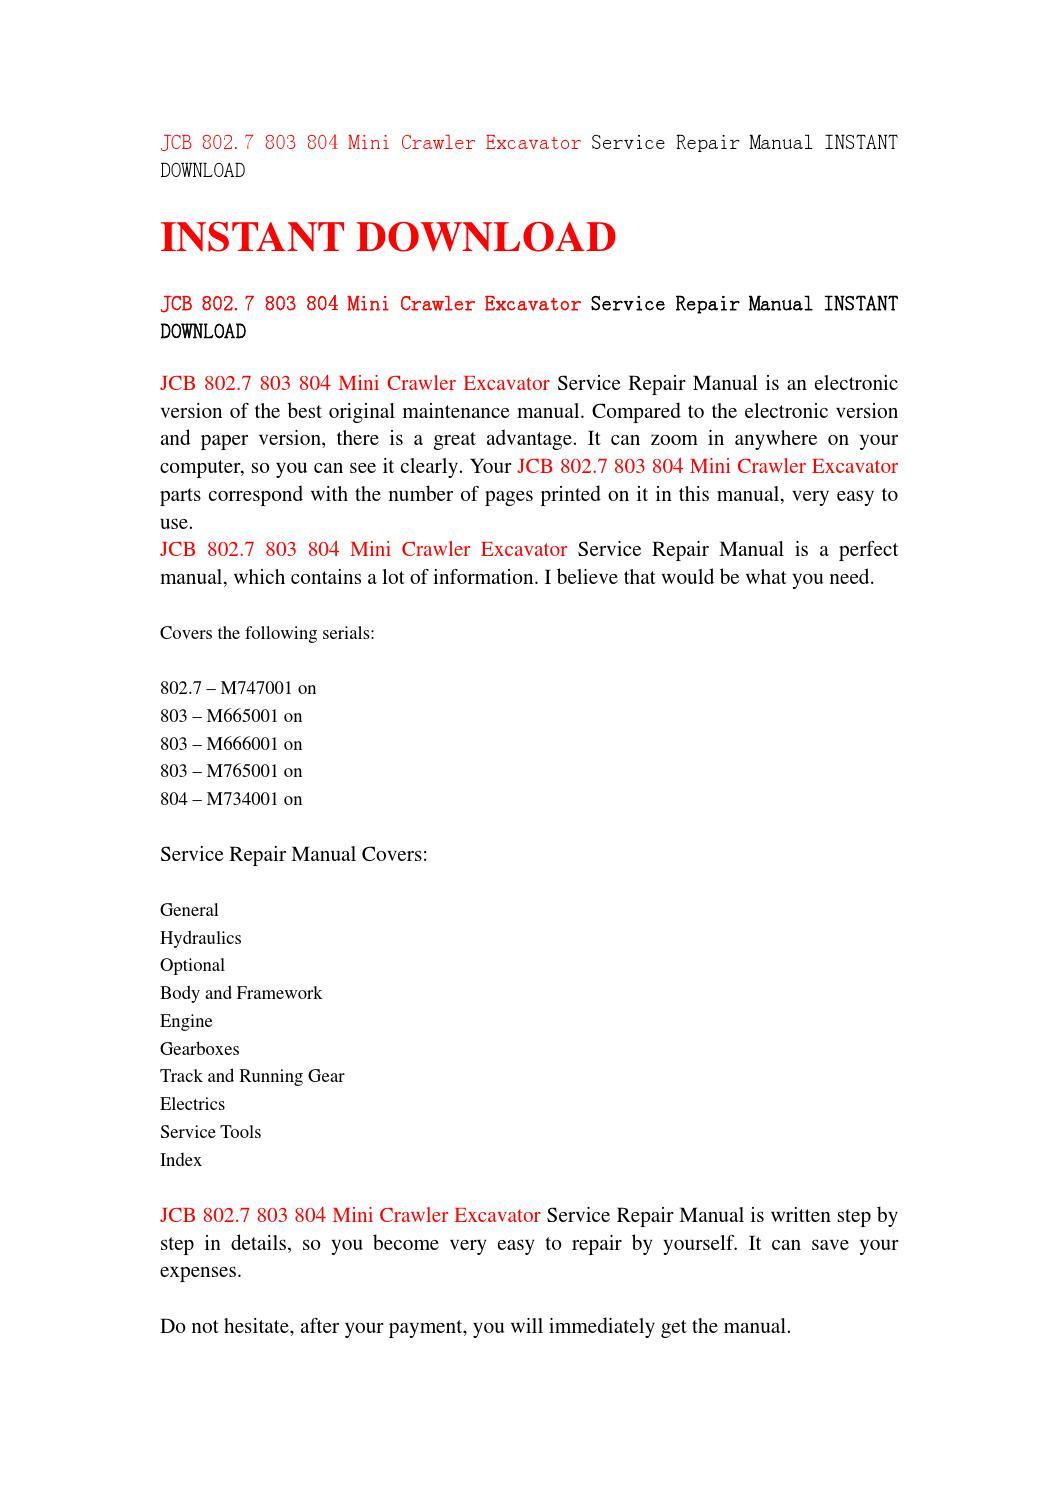 Jcb 802 7 803 804 mini crawler excavator service repair manual instant  download by jshjfneh34 - issuu